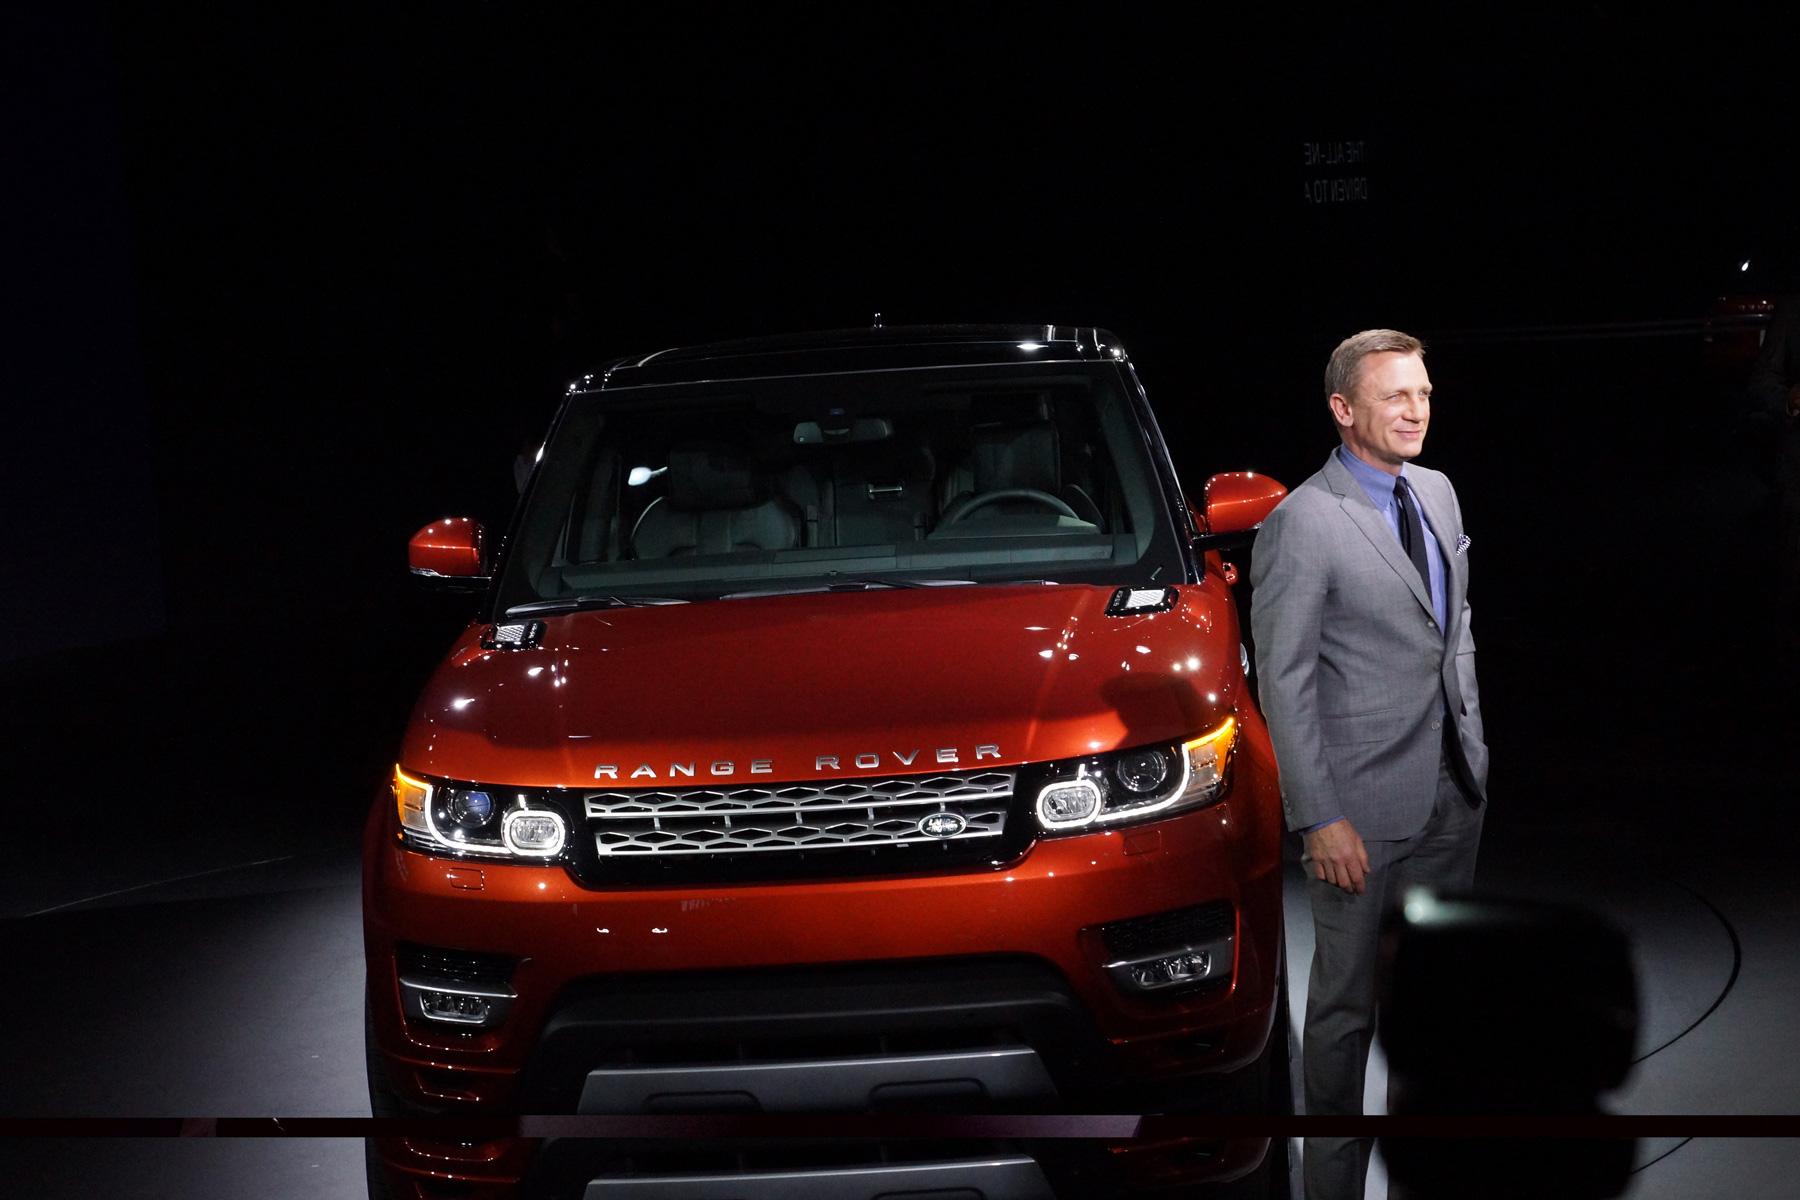 Daniel Craig launches the new Range Rover Sport